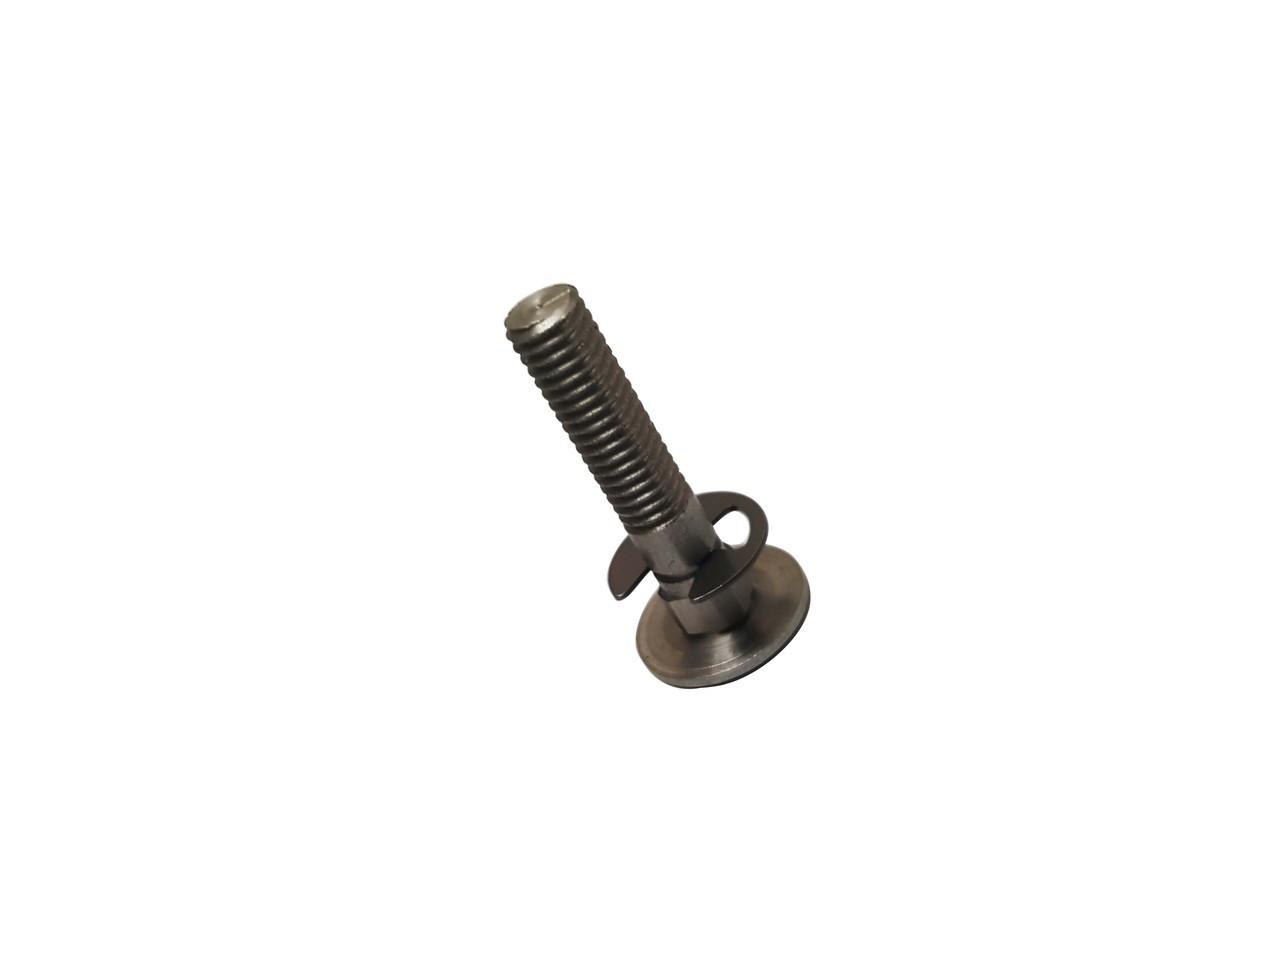 Bizerba Slicer - Remnant Holder Threaded Stud and Retaining Ring - SE12 - BZ091